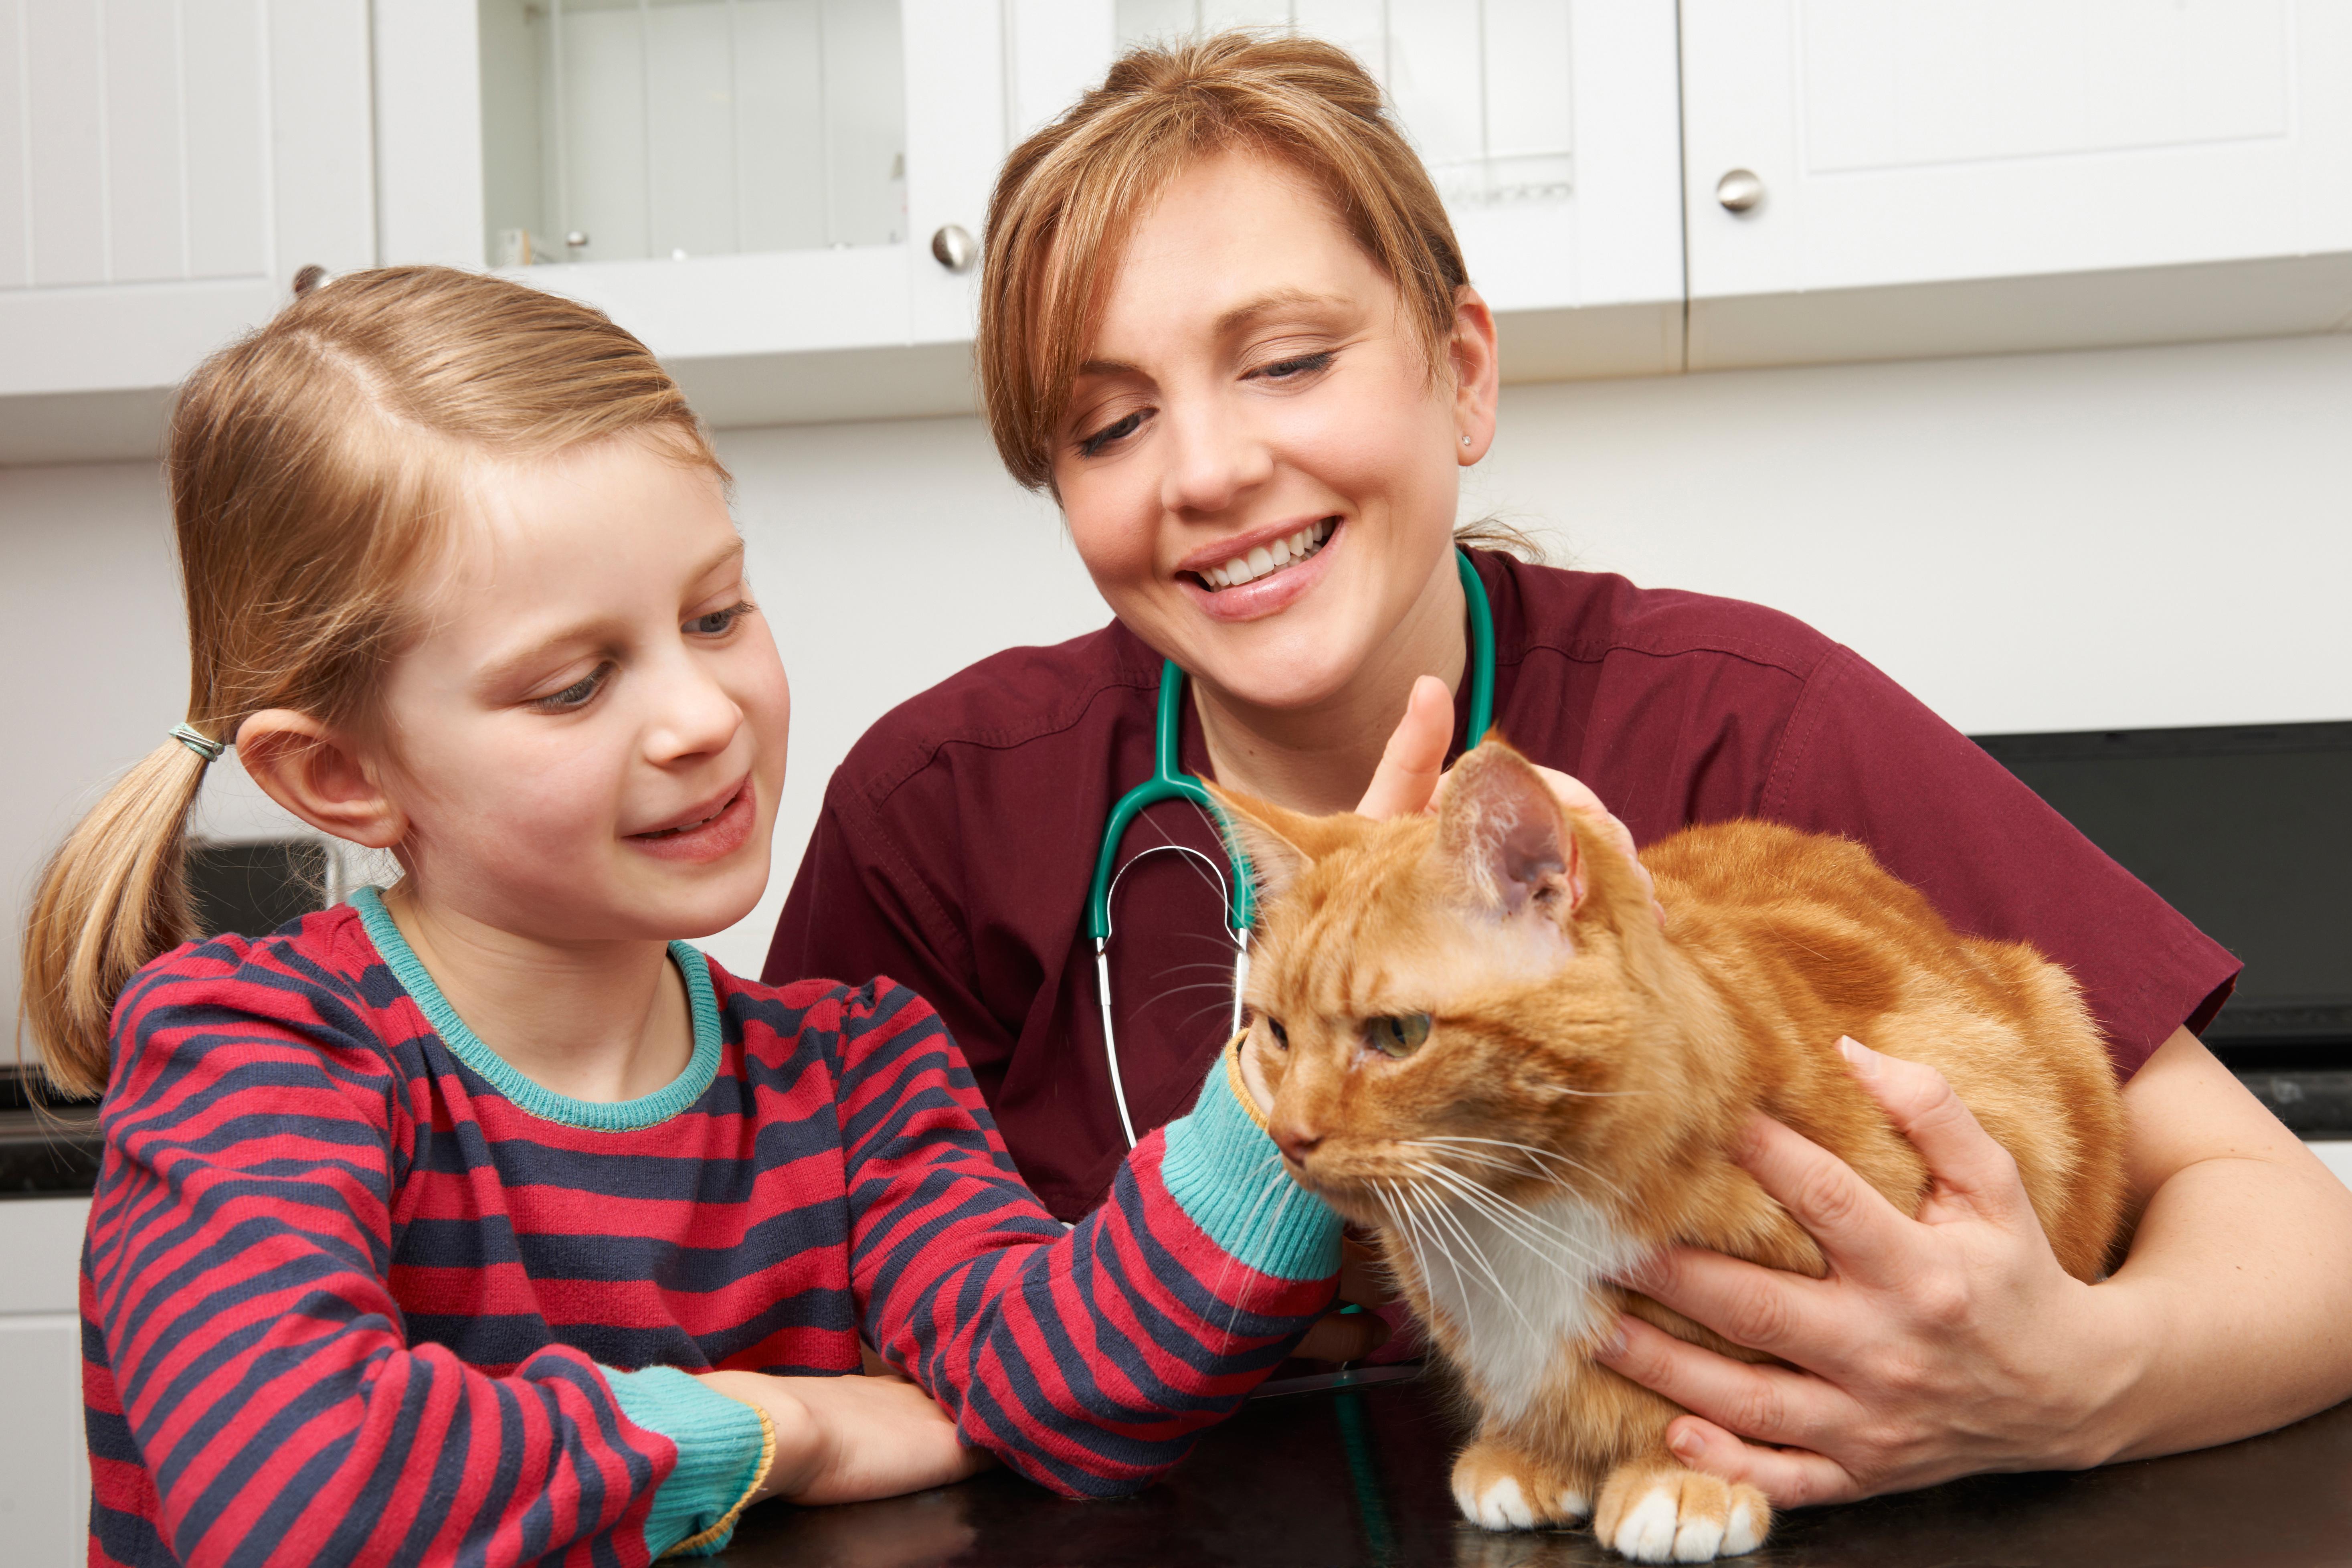 ajax vet hospital-mobile dogs cats rabbits ferrets, guinea